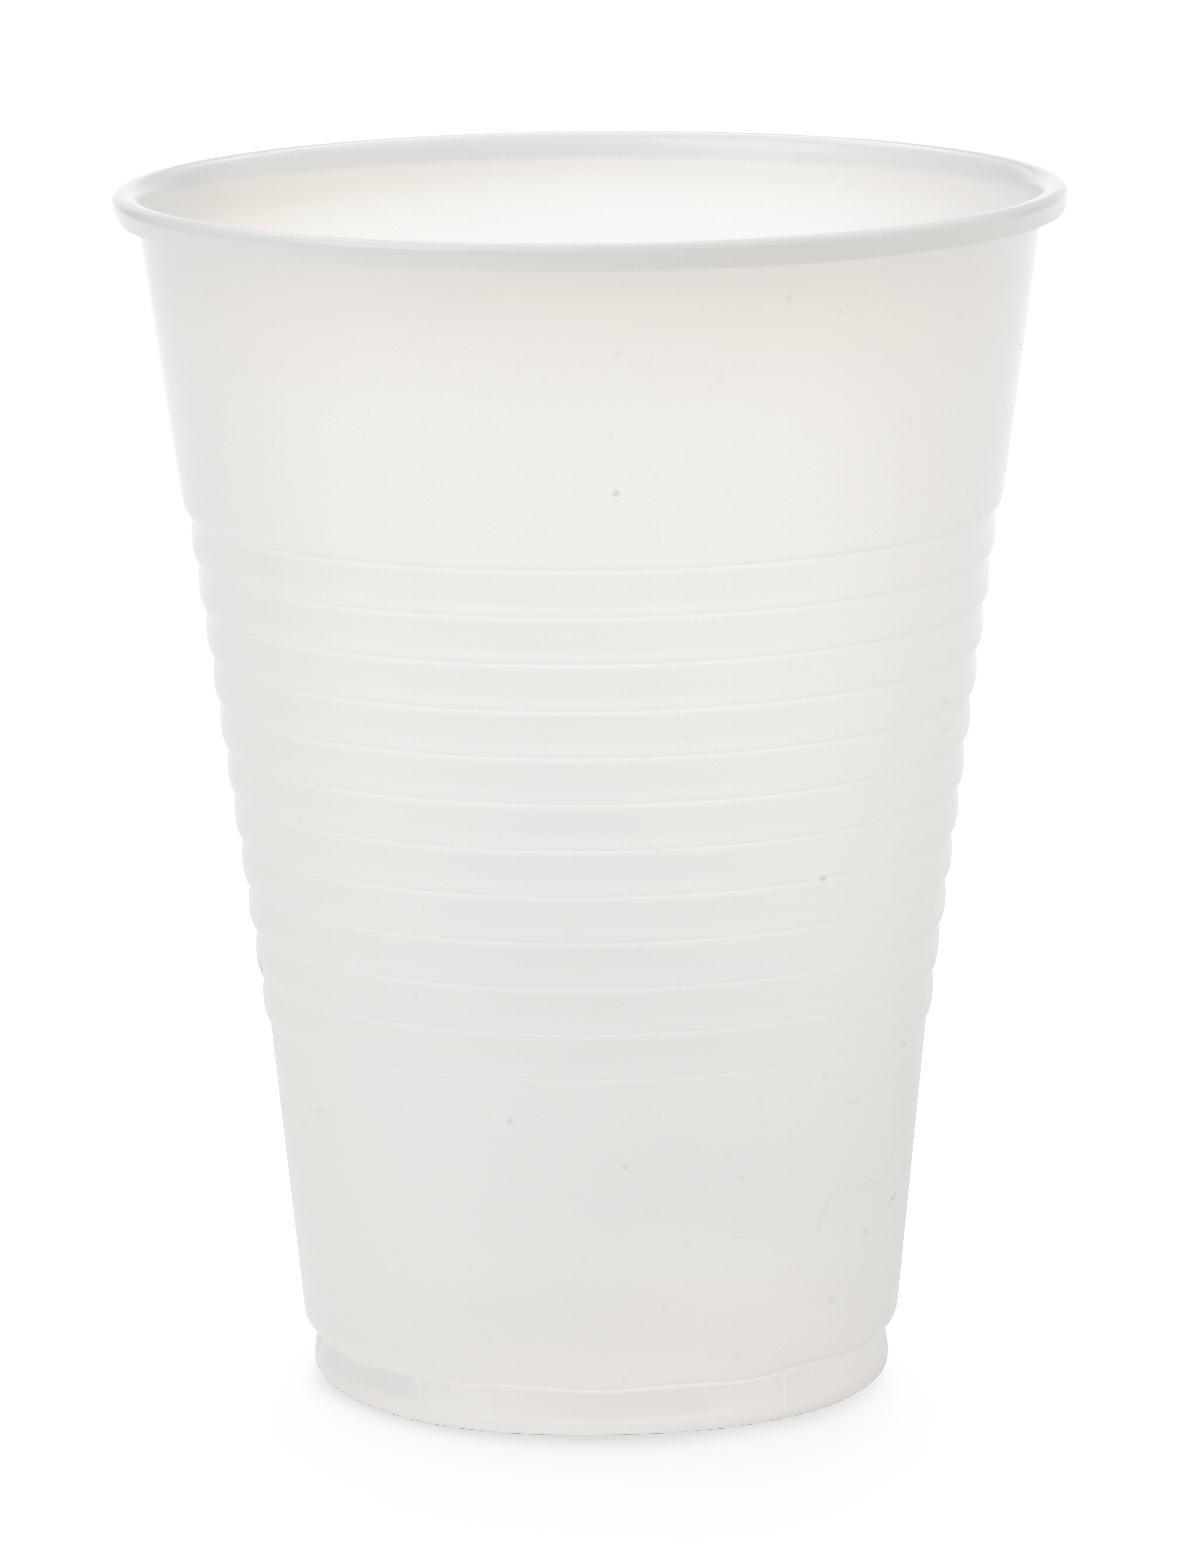 Medline NON03009H Cup, Plastic, 9 oz, Translucent (Pack of 100)